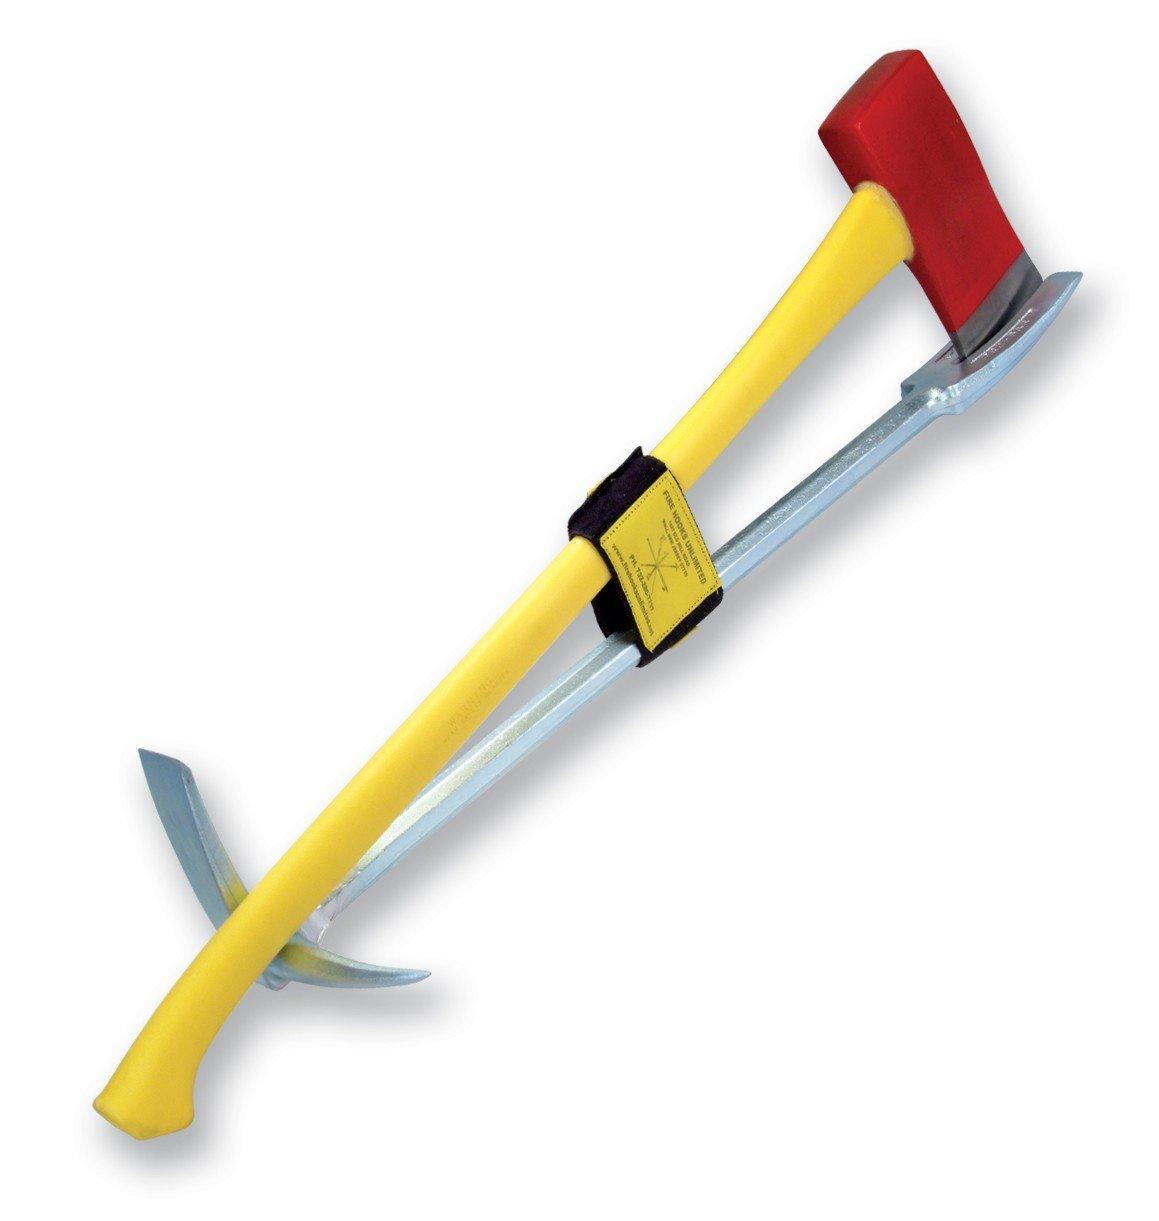 Leatherhead Tools KLB302 Halligan and Axe Yellow Fiberglass 36in.